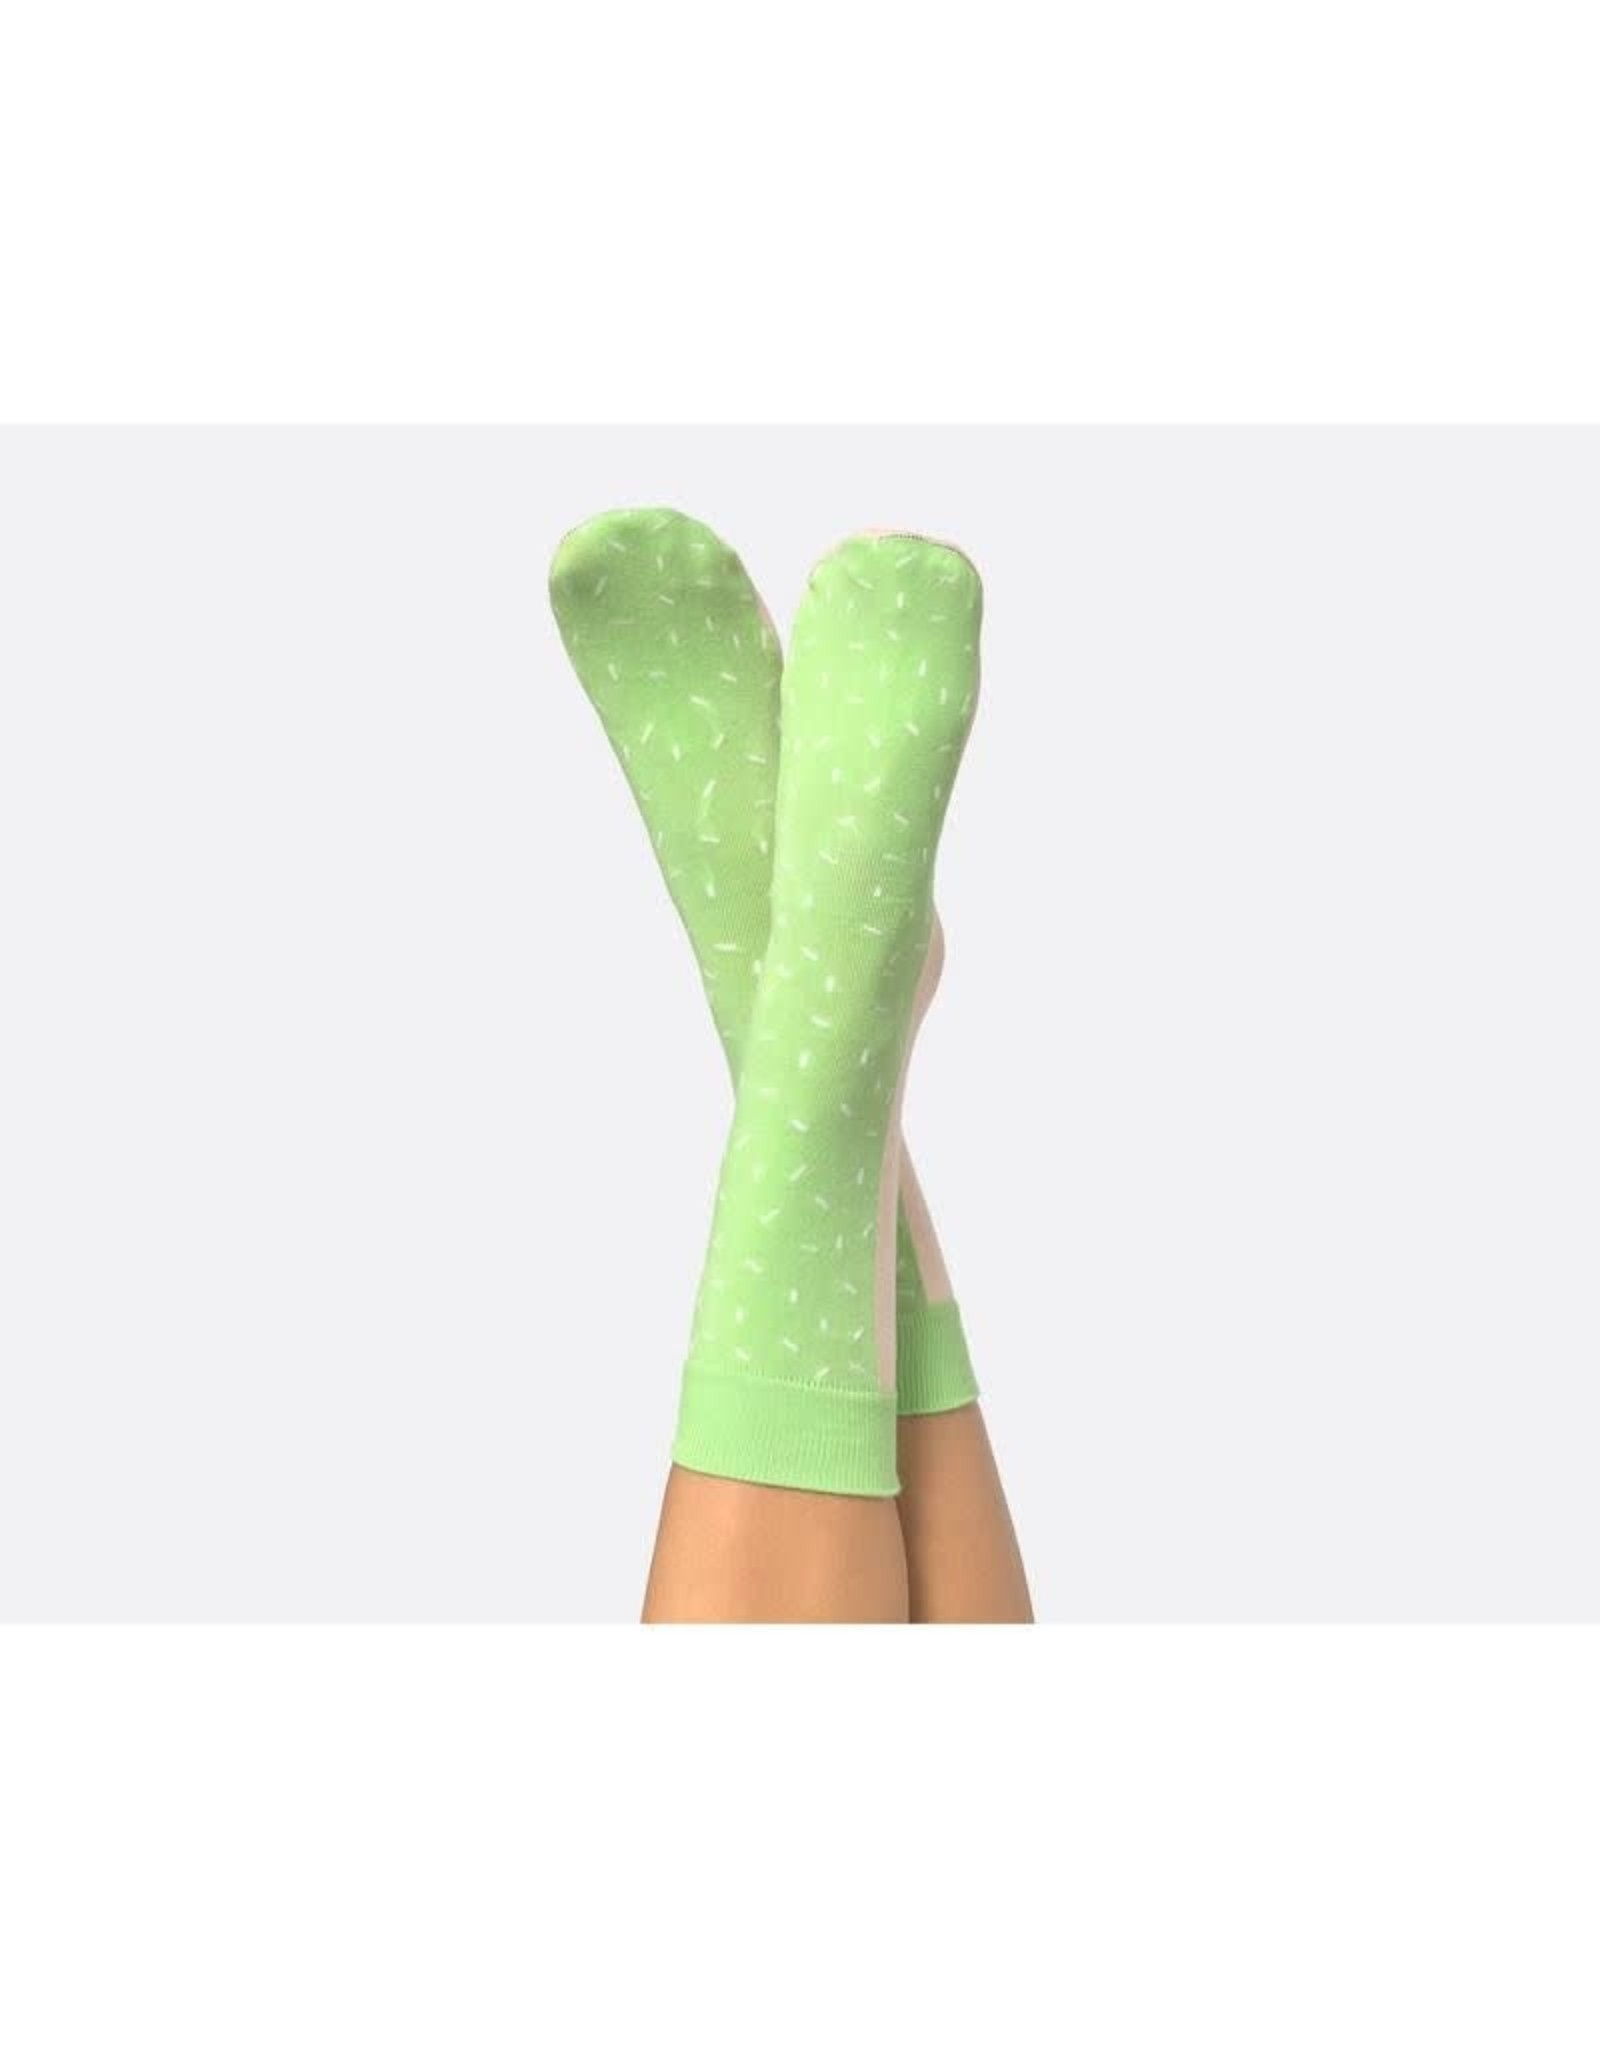 socks with ice cream design